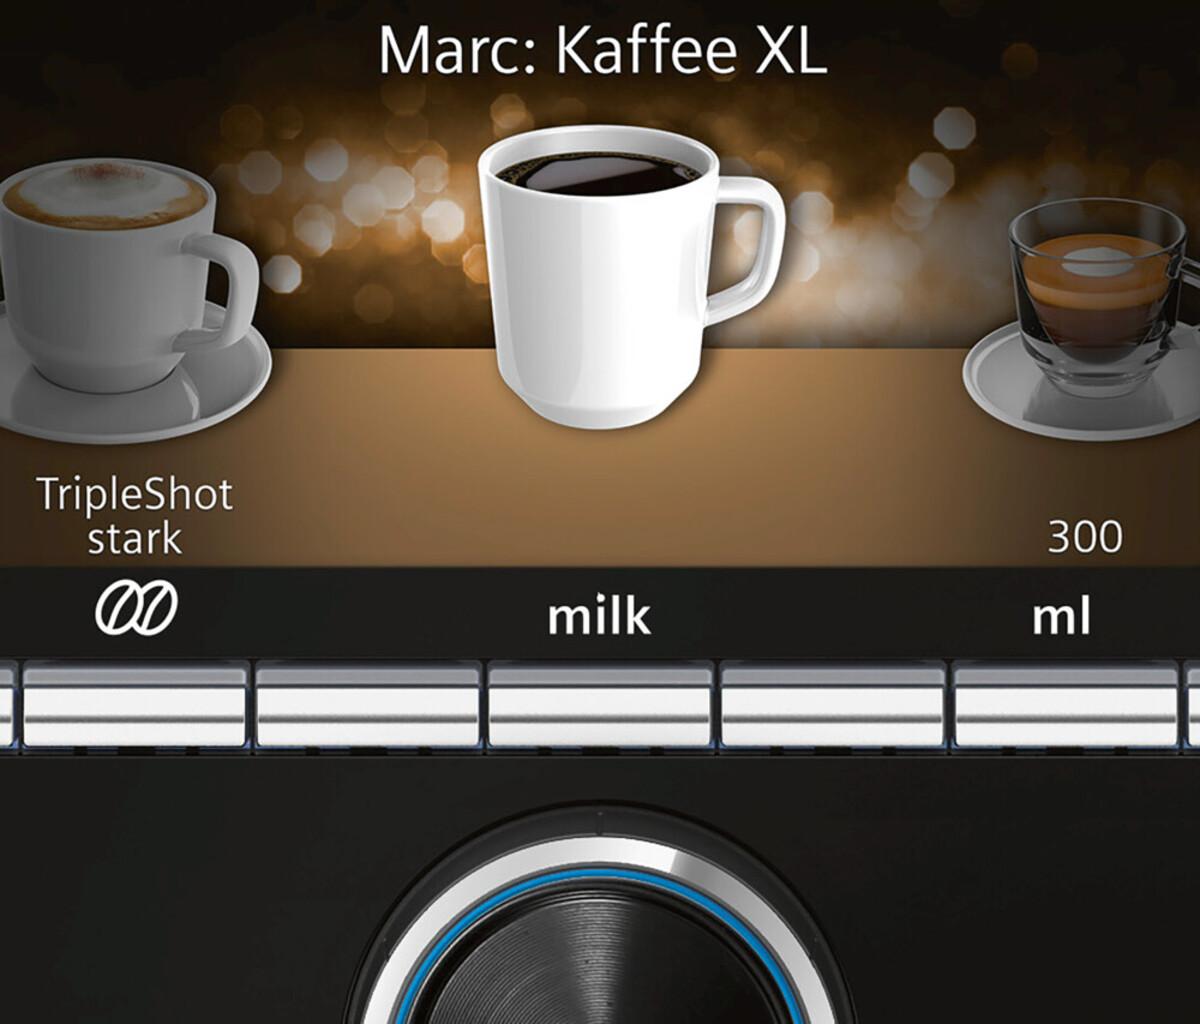 Bild 4 von EQ.9 plus connect s500 TI9558X1DE Edelstahl Kaffeevollautomat